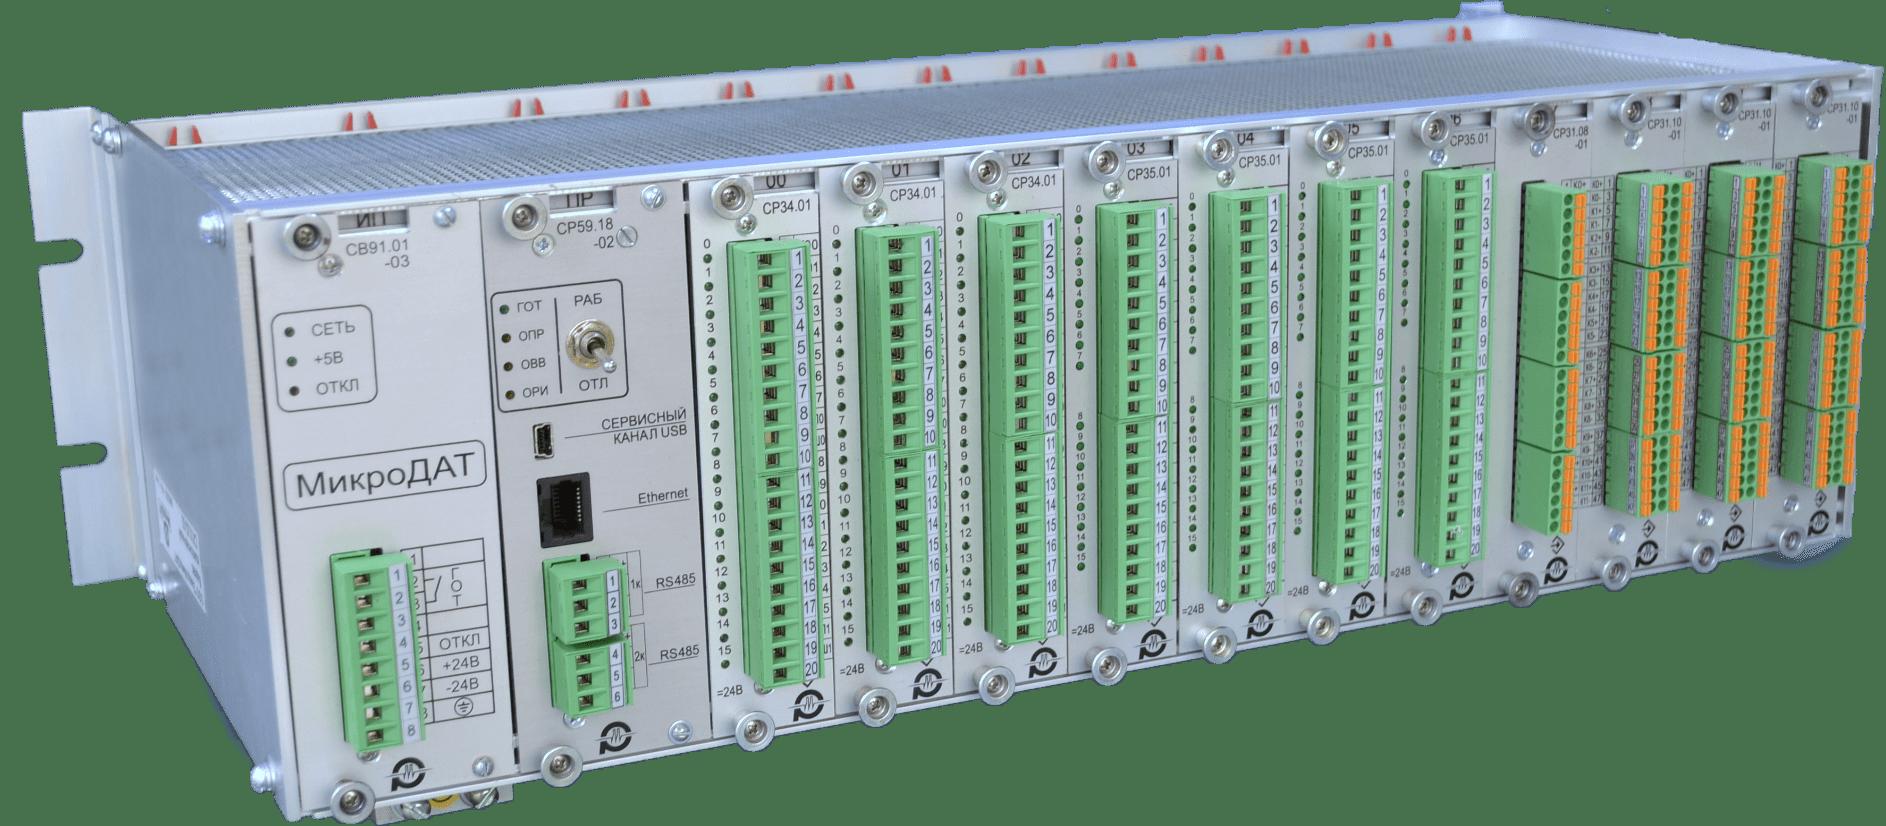 Системы контроля и автоматизации процессов на складах предприятий - control engineering russia